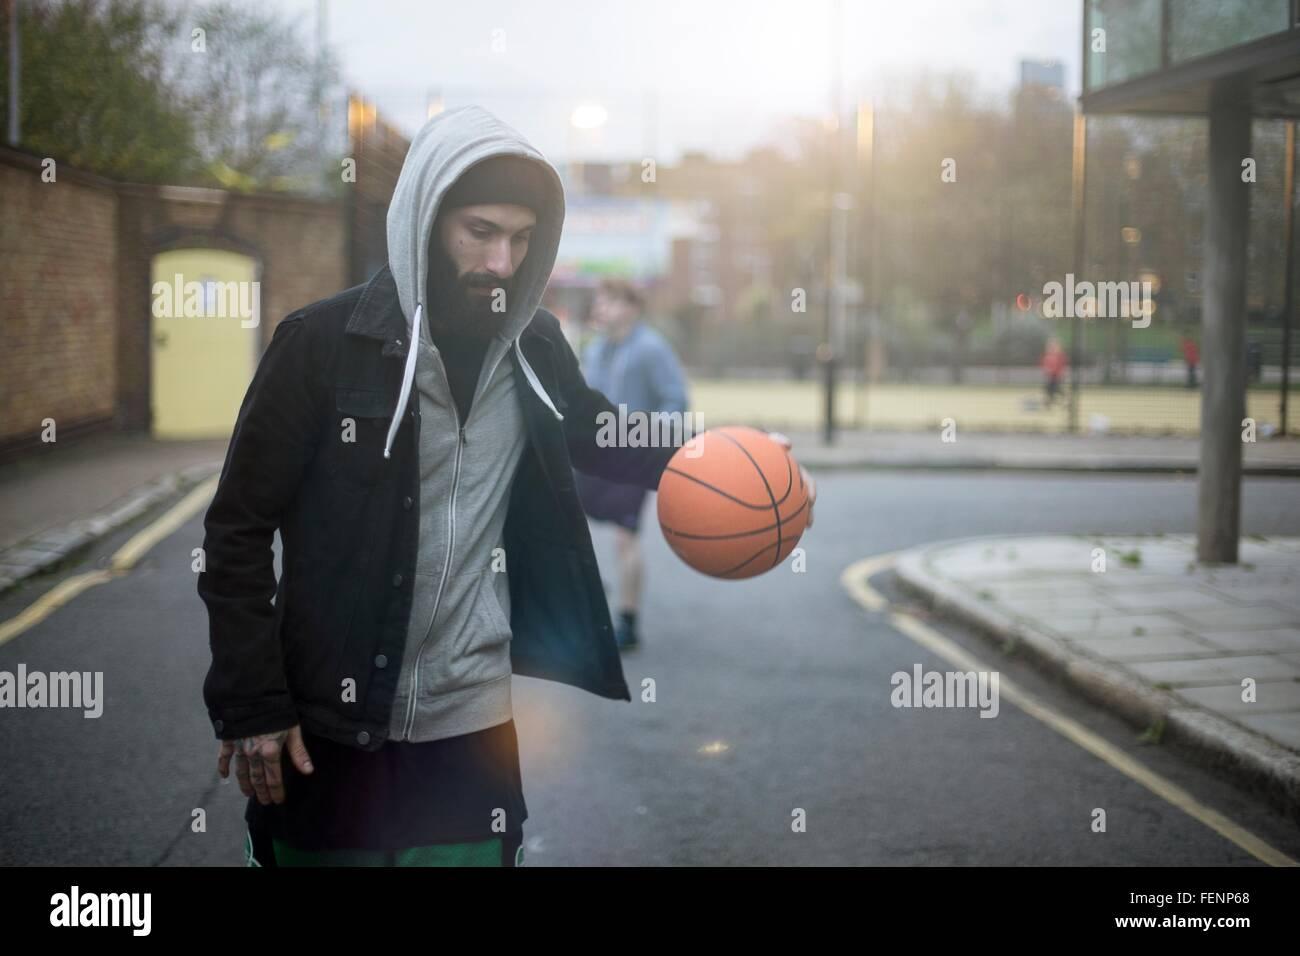 Mid adult man walking along street, bouncing basketball - Stock Image